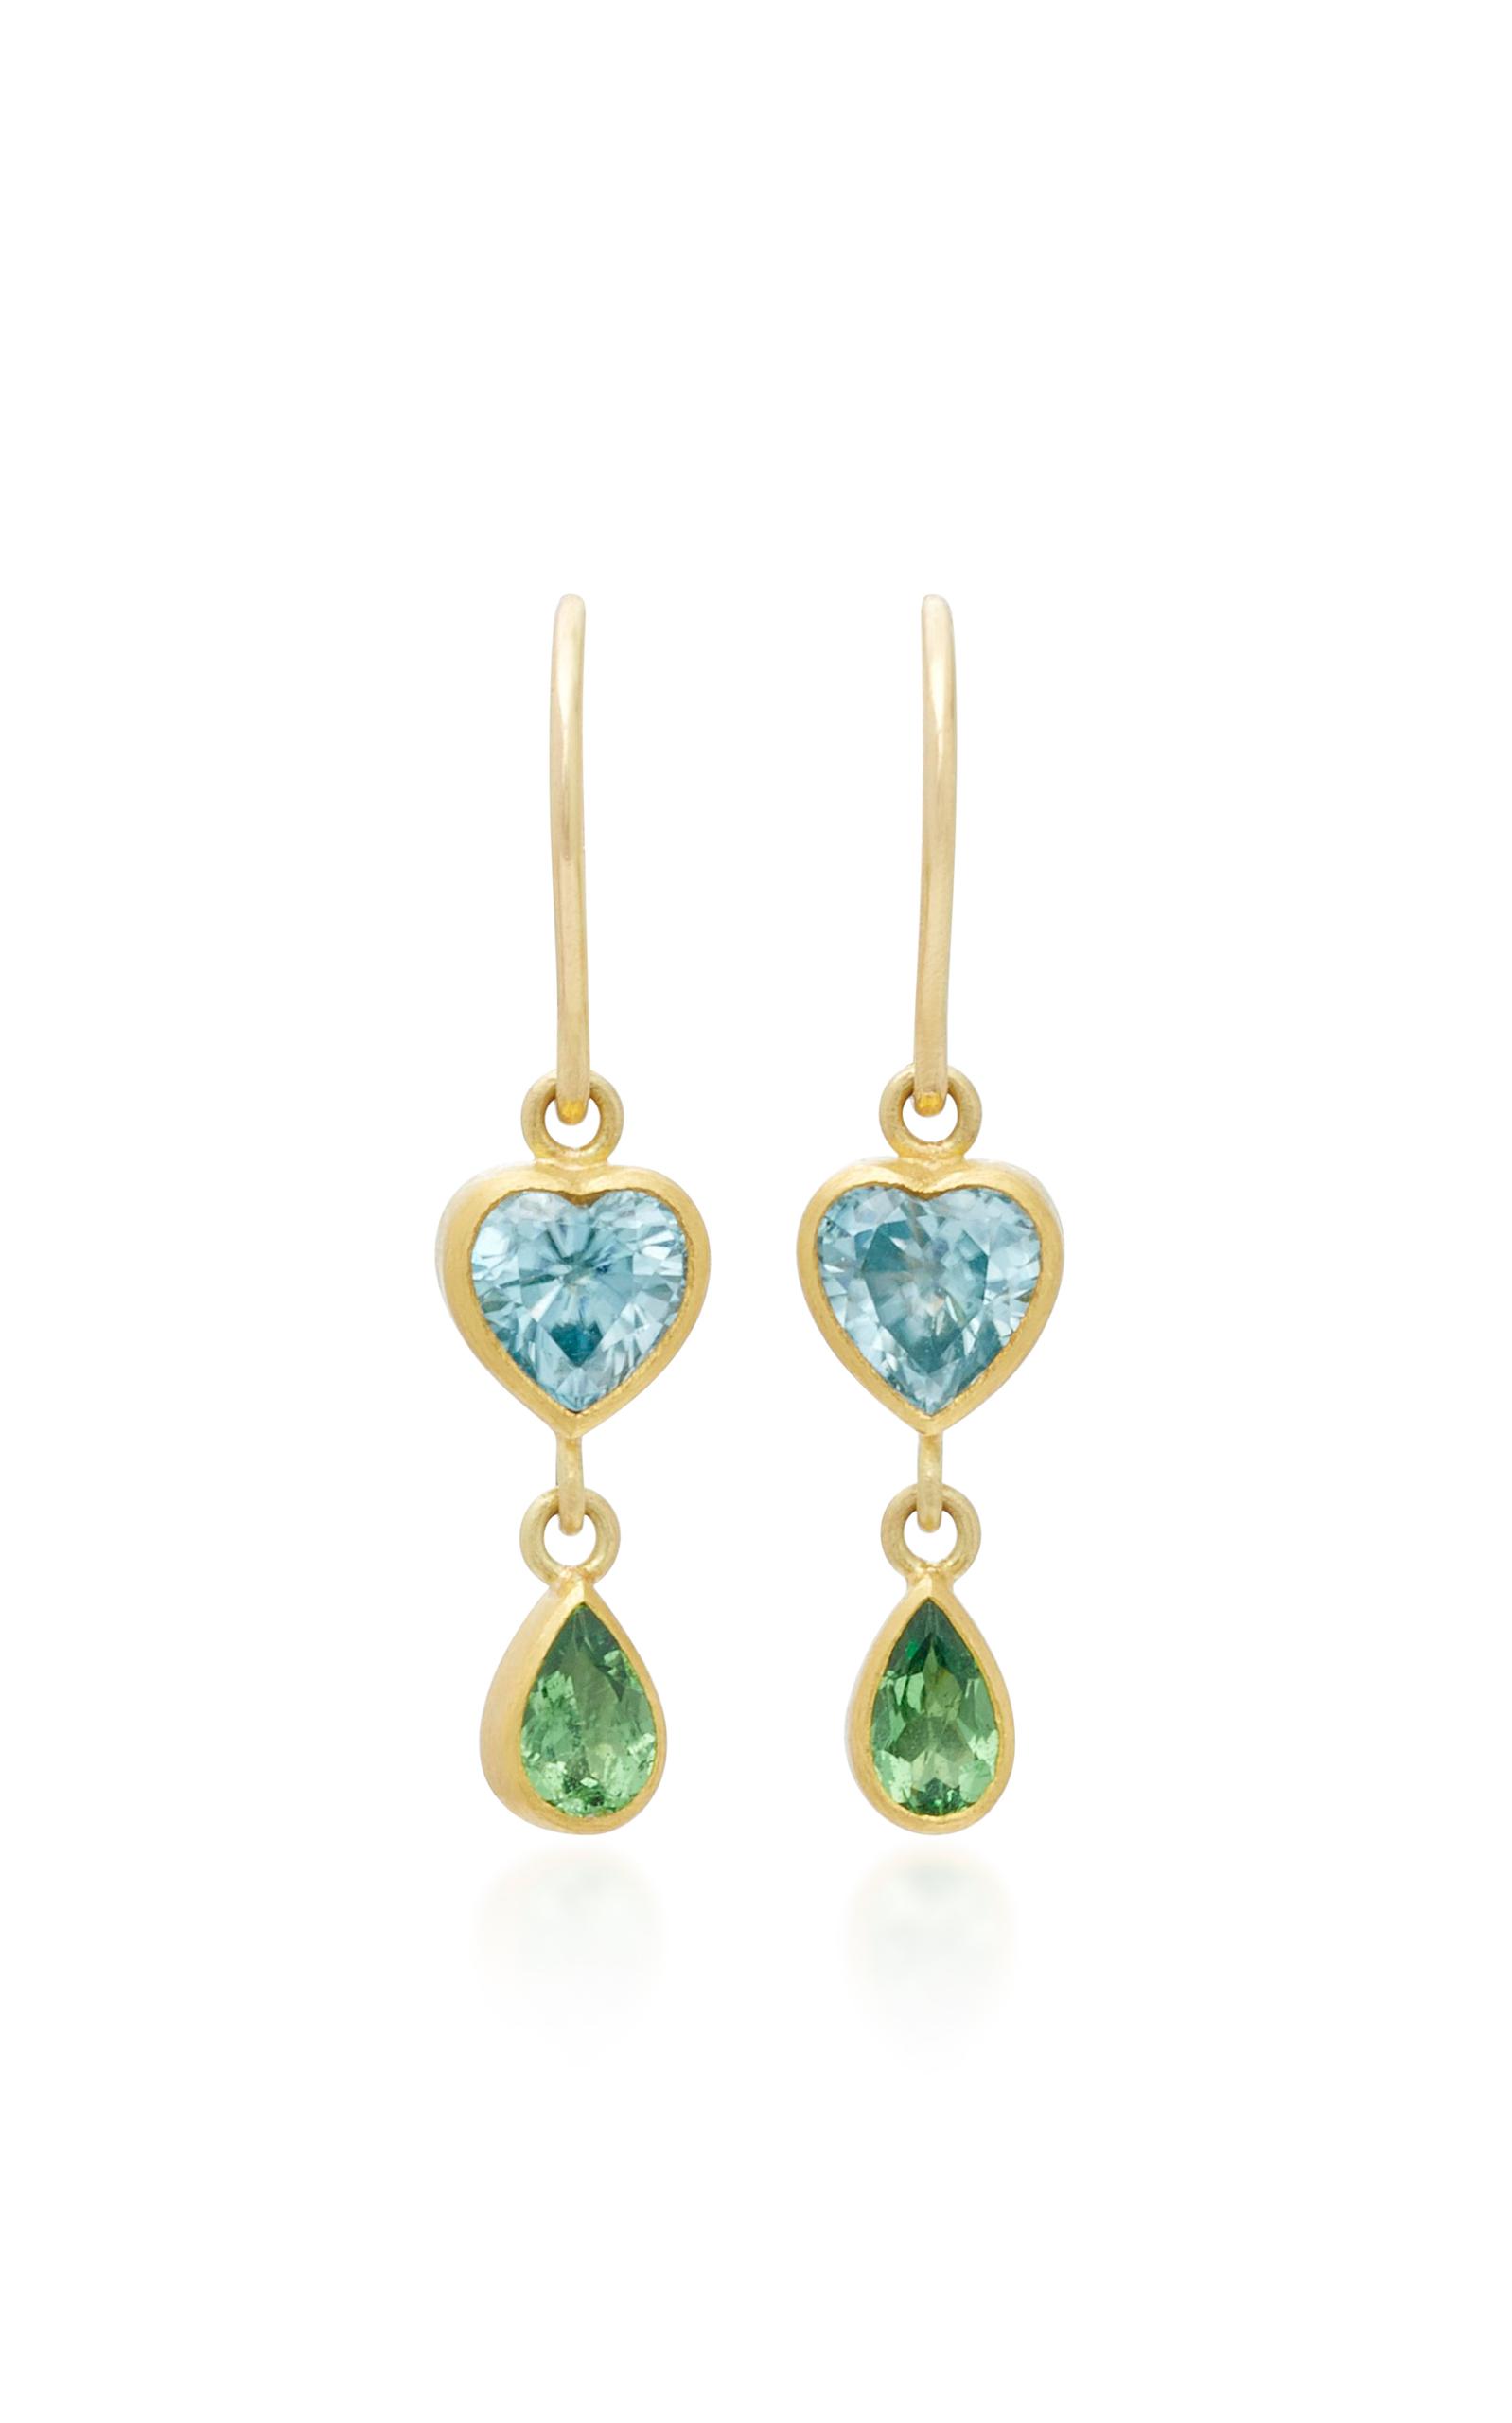 18K Gold Green Paraiba Earrings Mallary Marks vMXlT